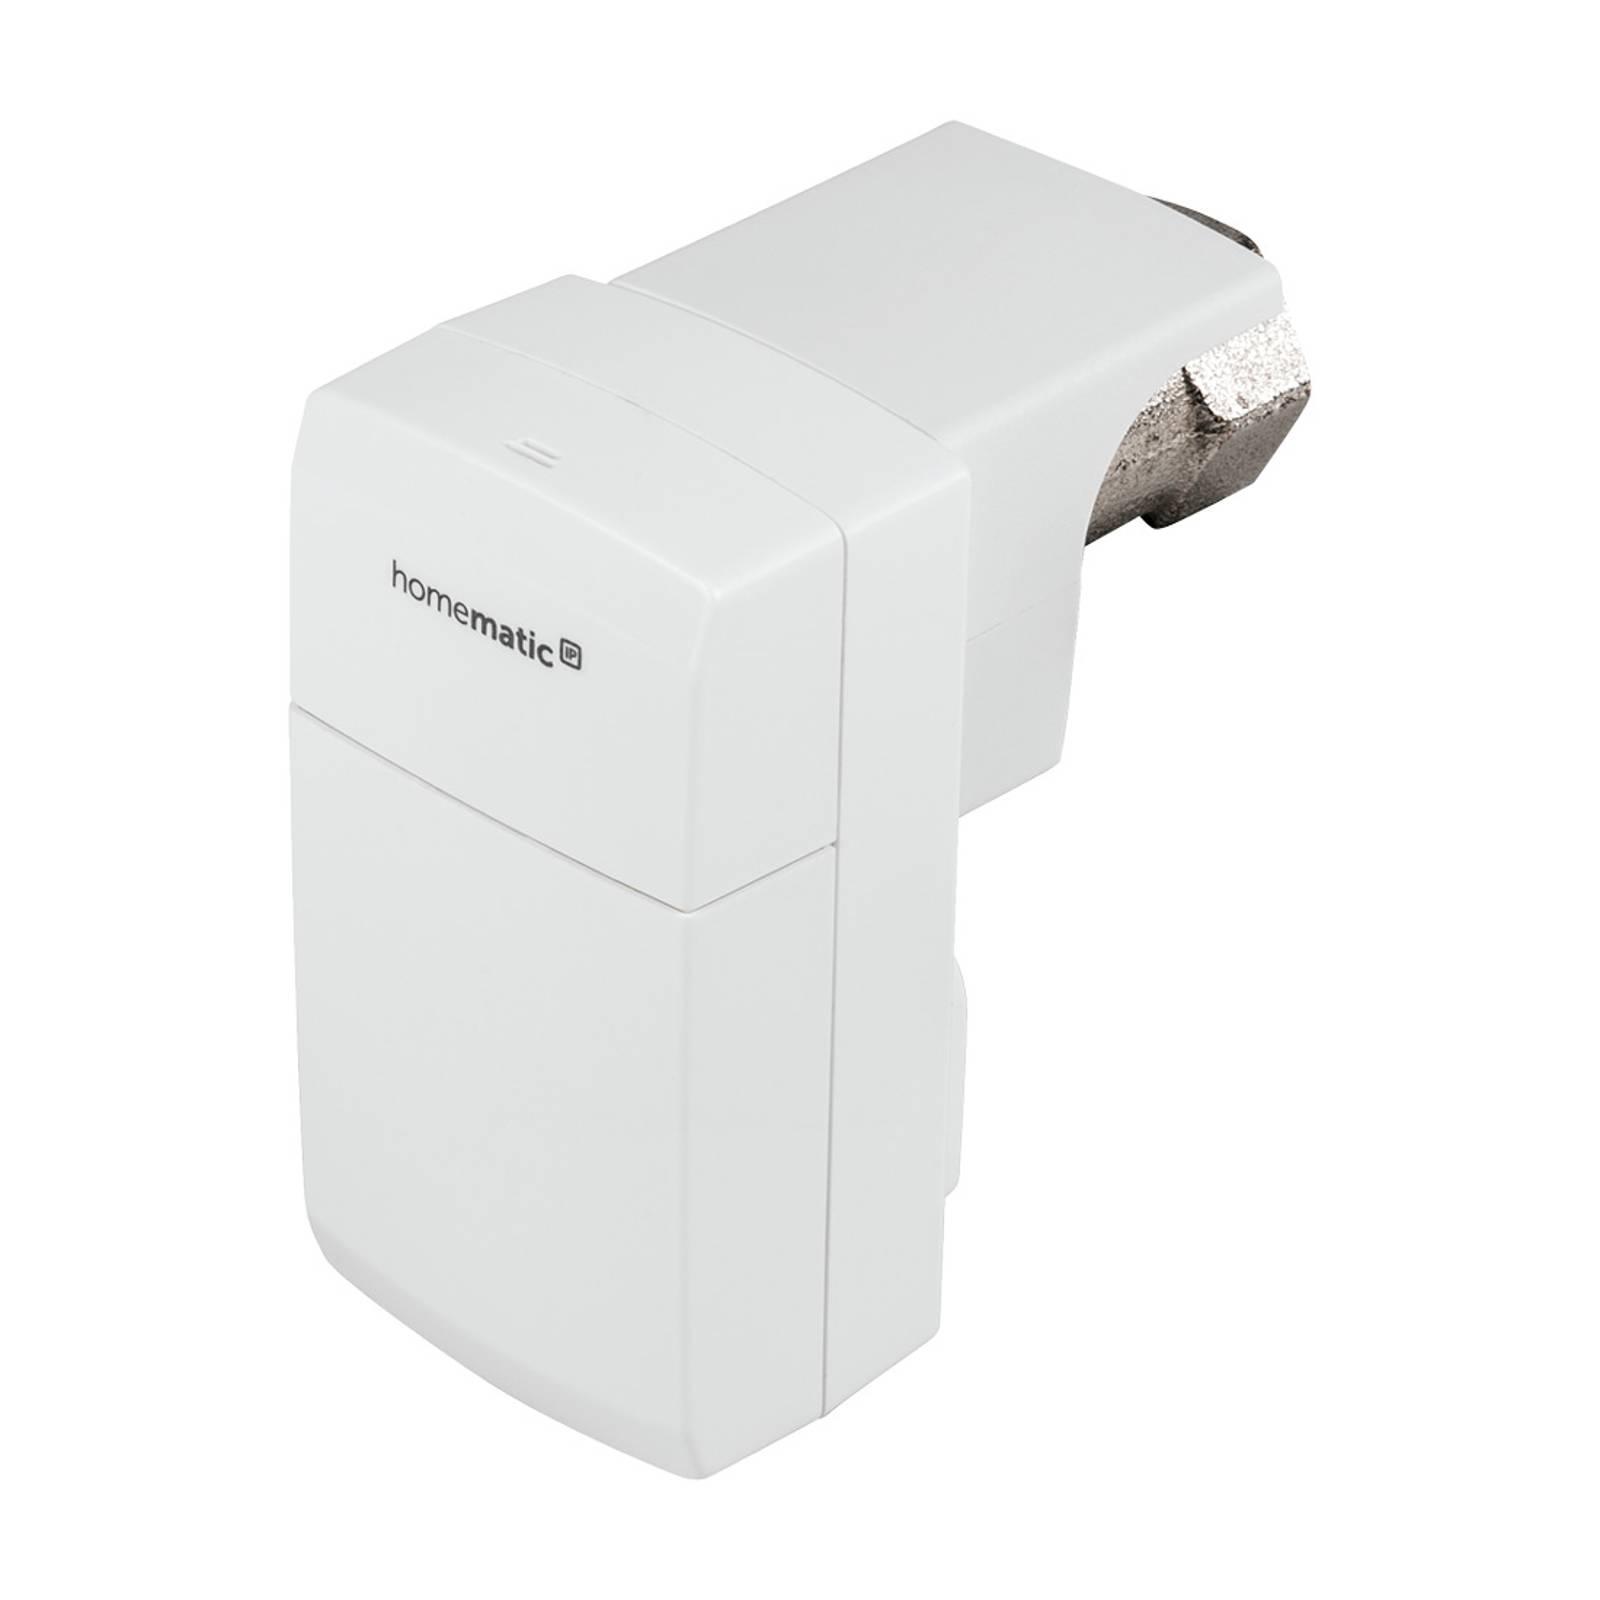 Homematic IP antismontaggio termostato 5x